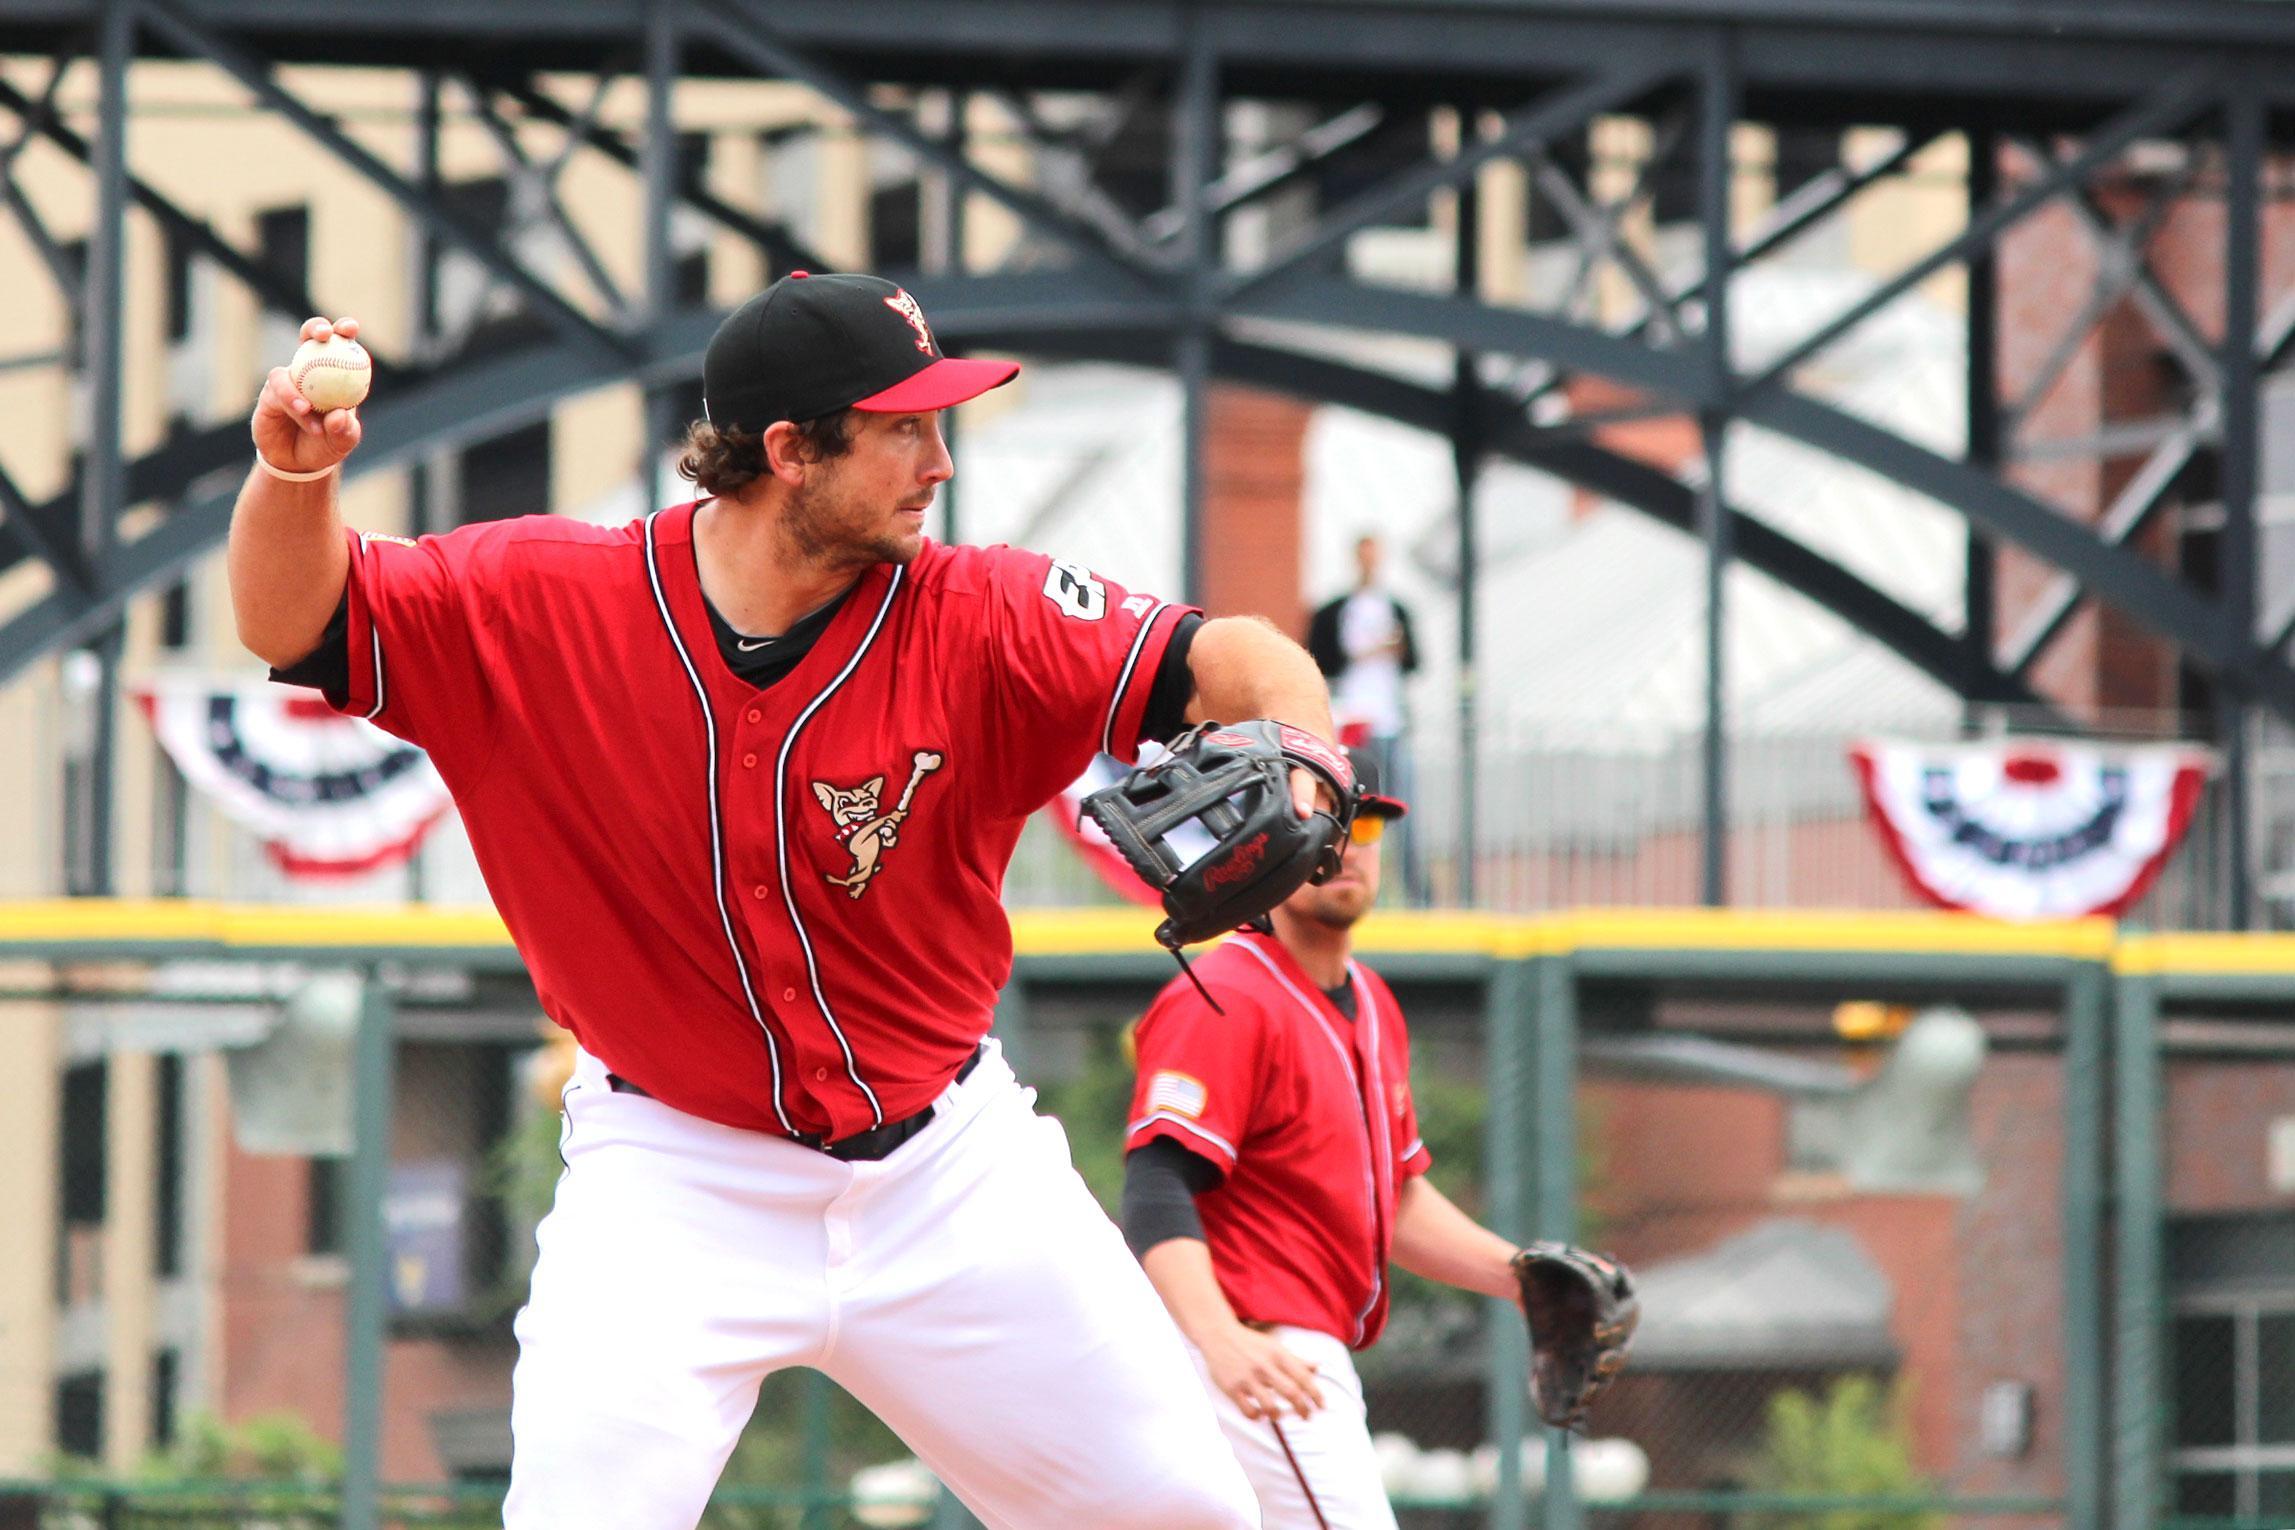 Chihuahuas third baseman Brett Wallace throws the ball toward first base during the team's season opener.